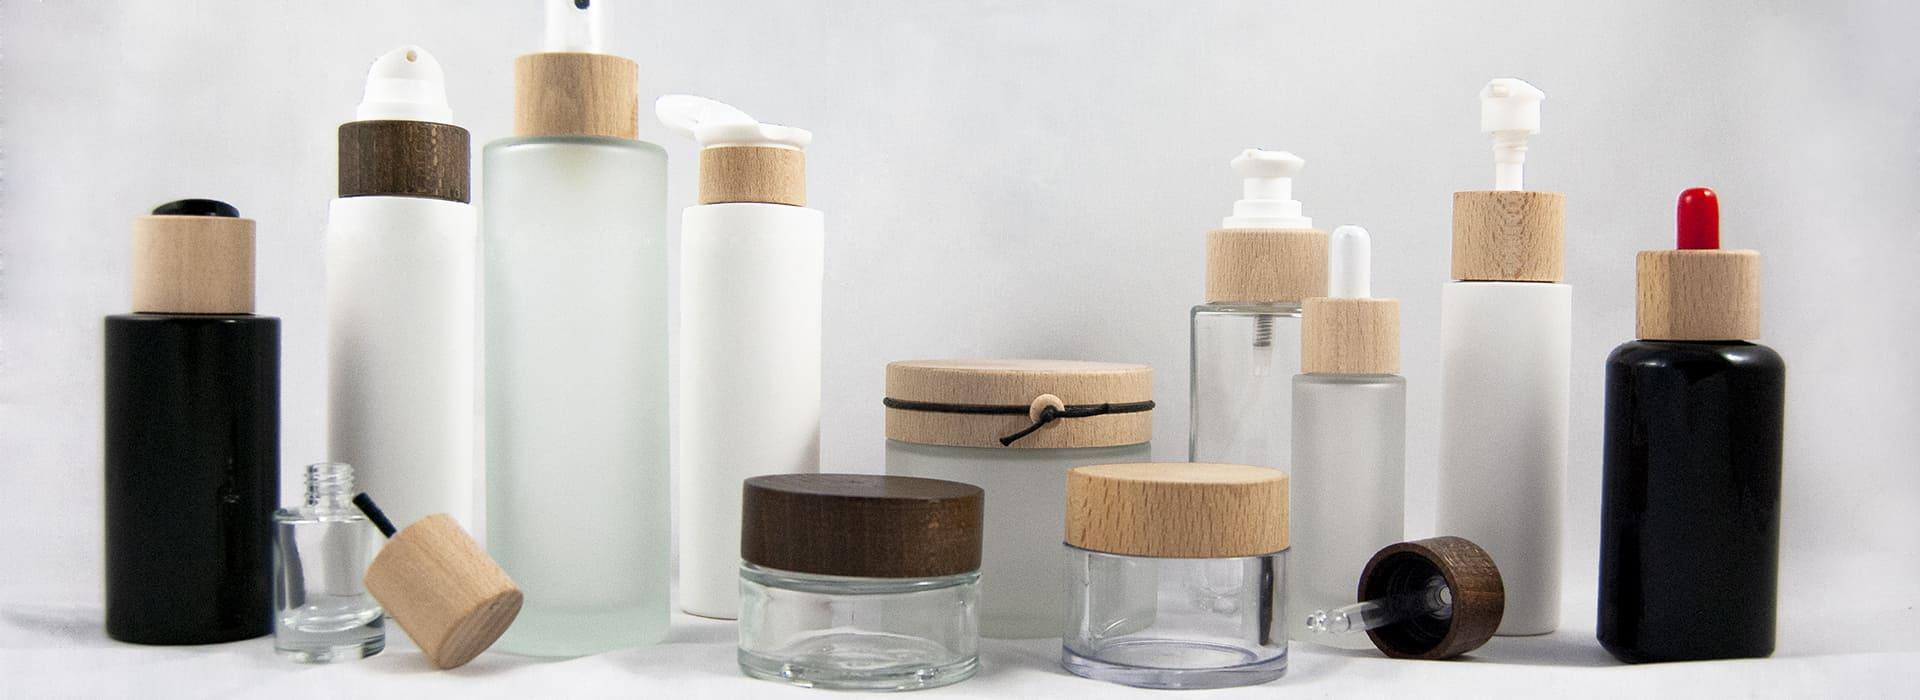 packaging cosmetici personalizzati ecologici